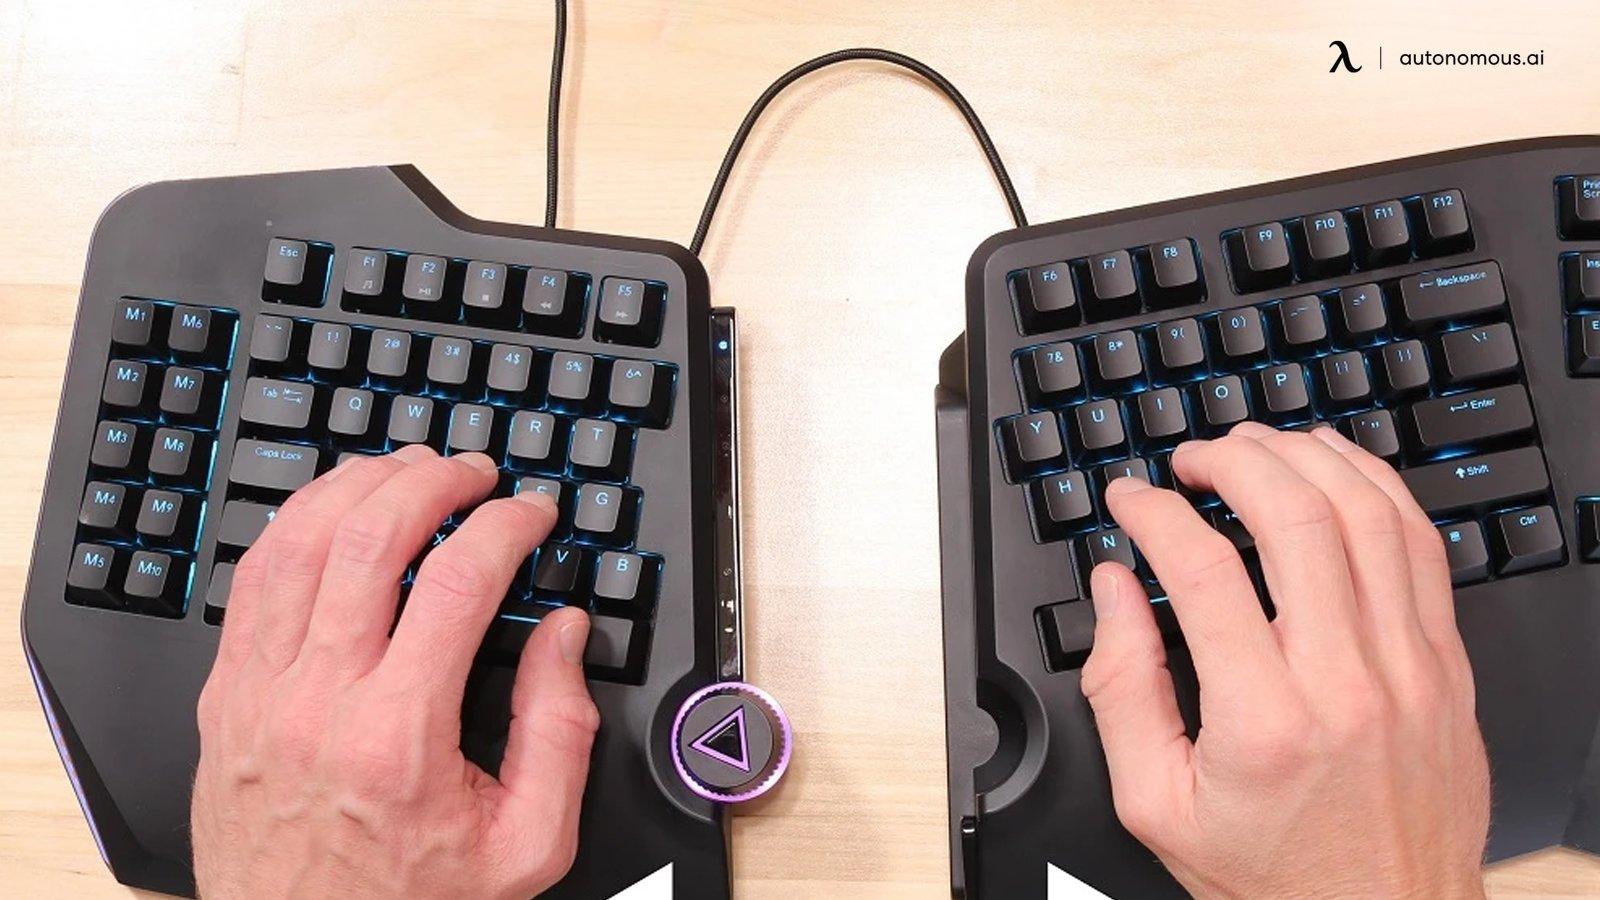 Ergo keyboard example